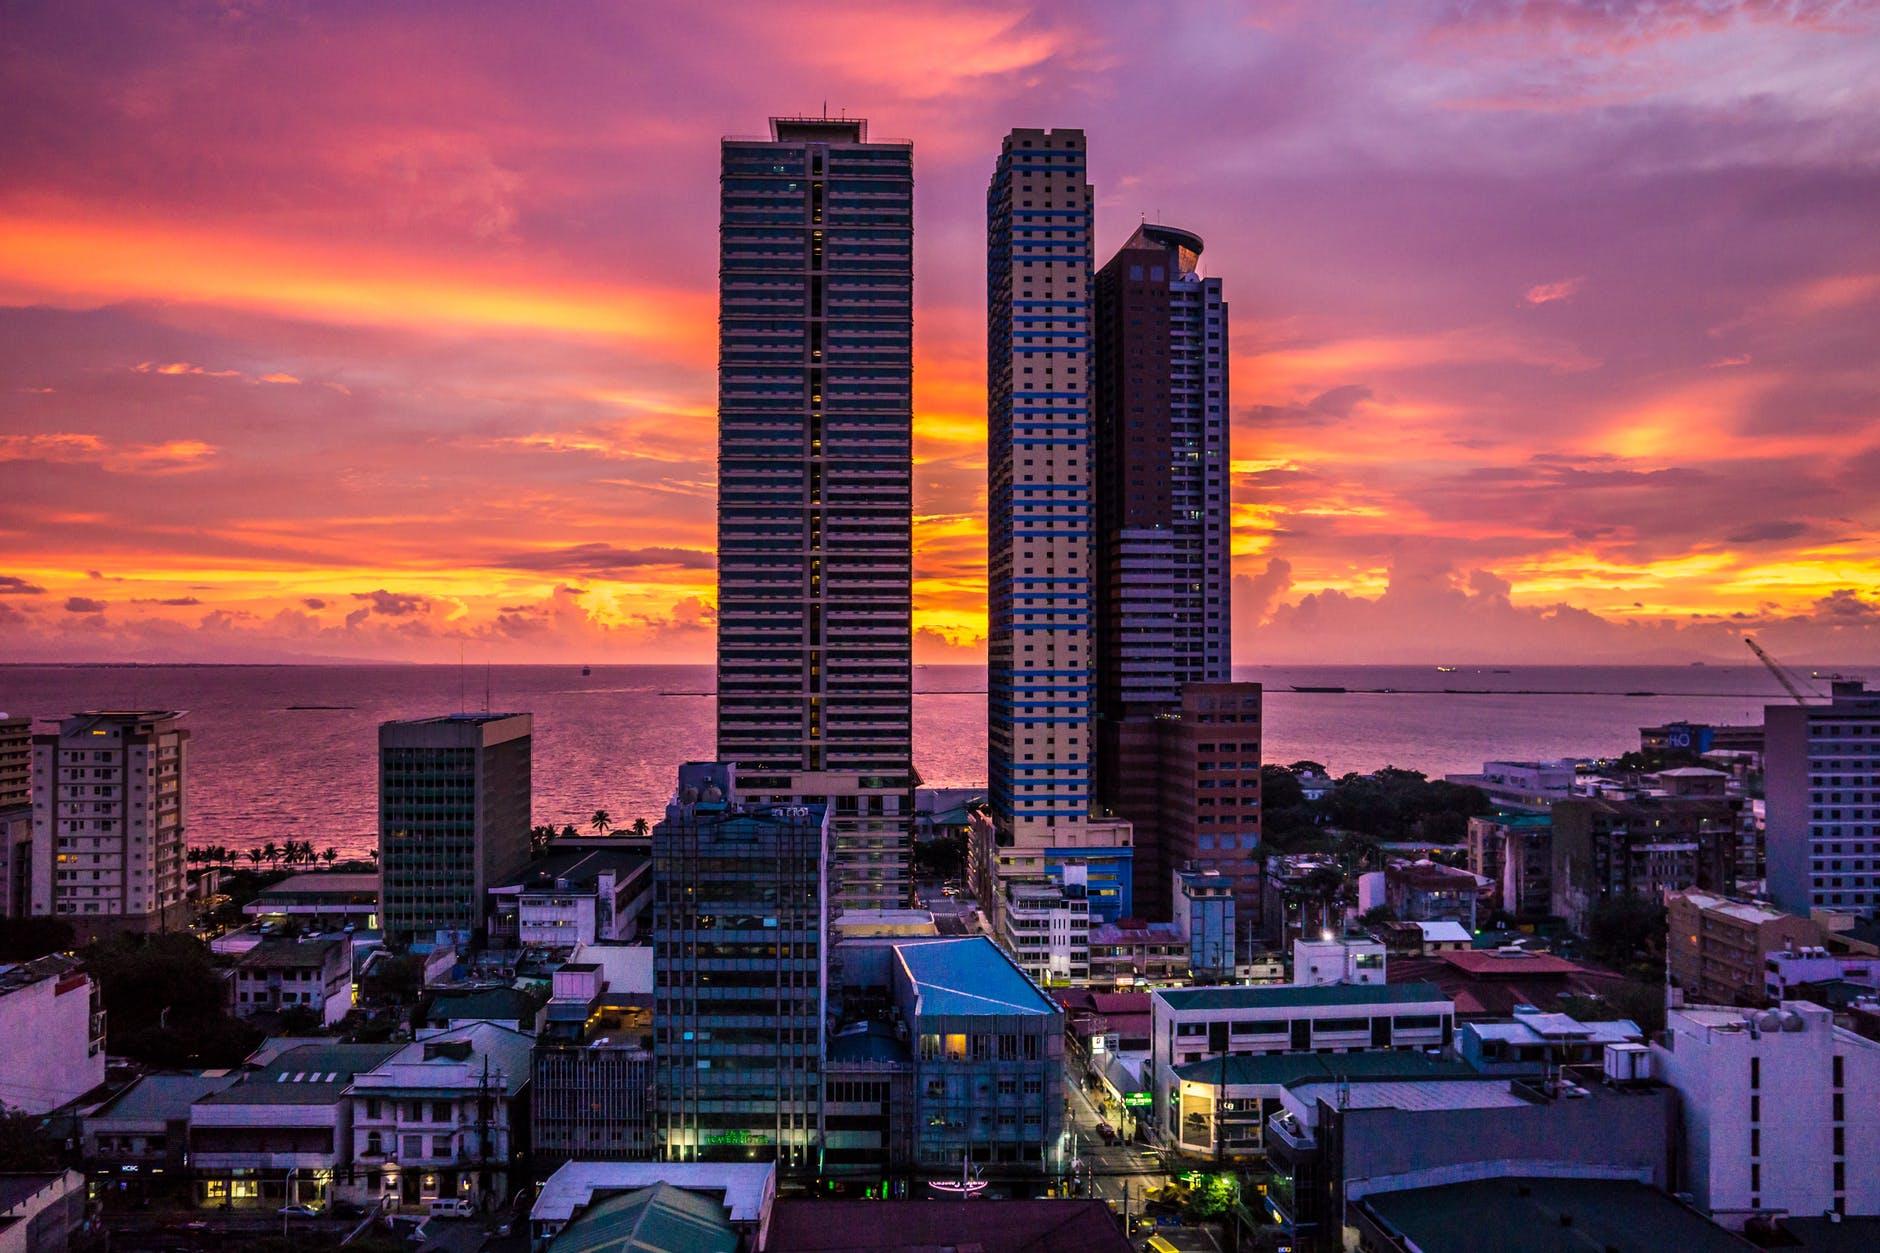 Philippines - Taza